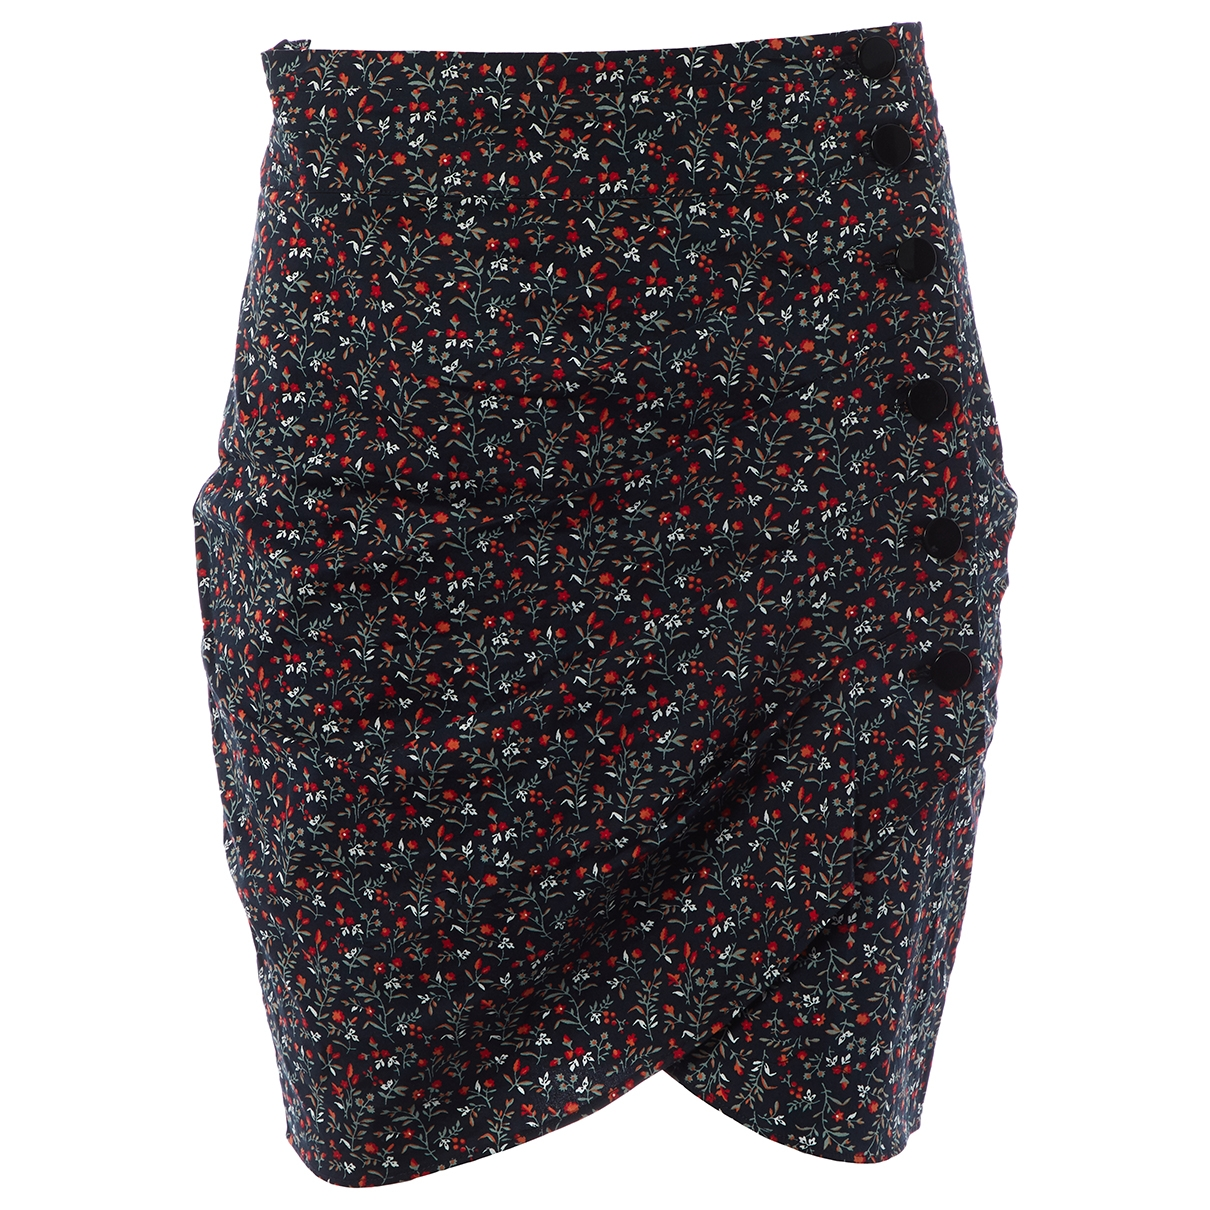 Ba&sh X Vestiaire Collective Sunshine Navy Cotton skirt for Women 3 0-5